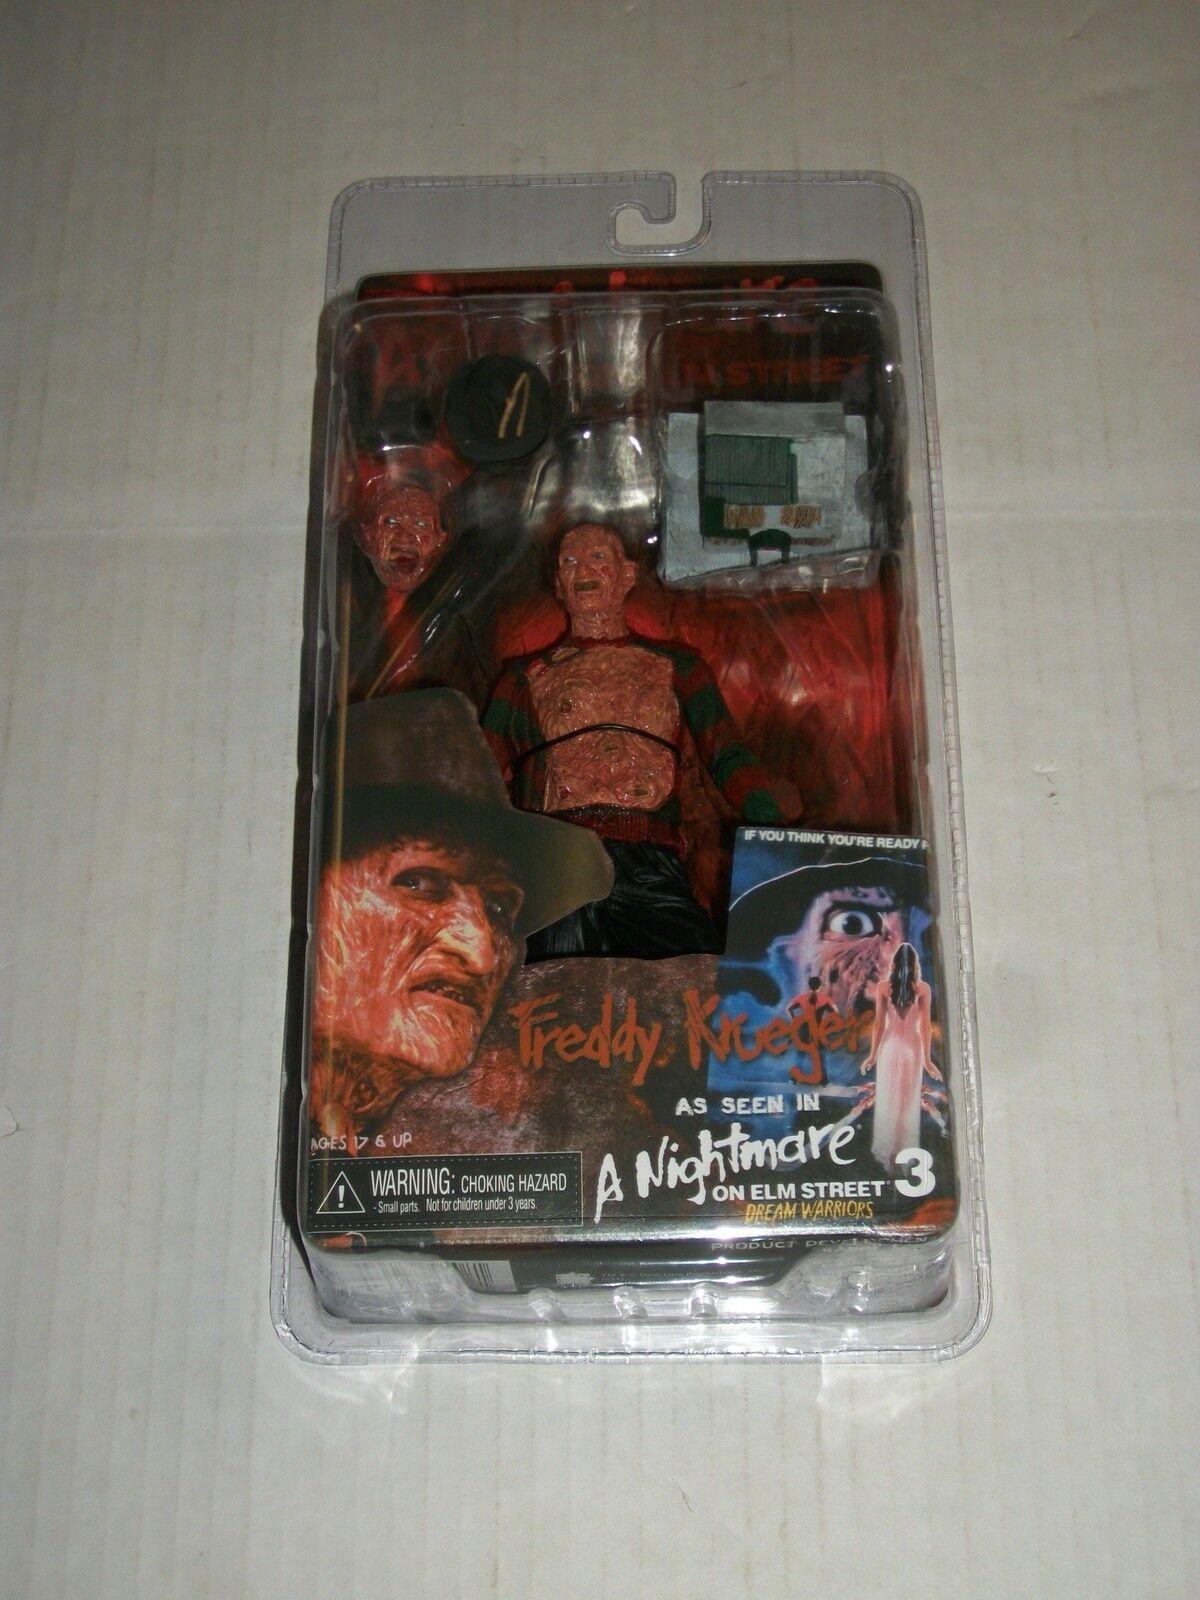 NECA A Nightmare on Elm Street 3 FROTDY KRUEGER Action Figure Series 2